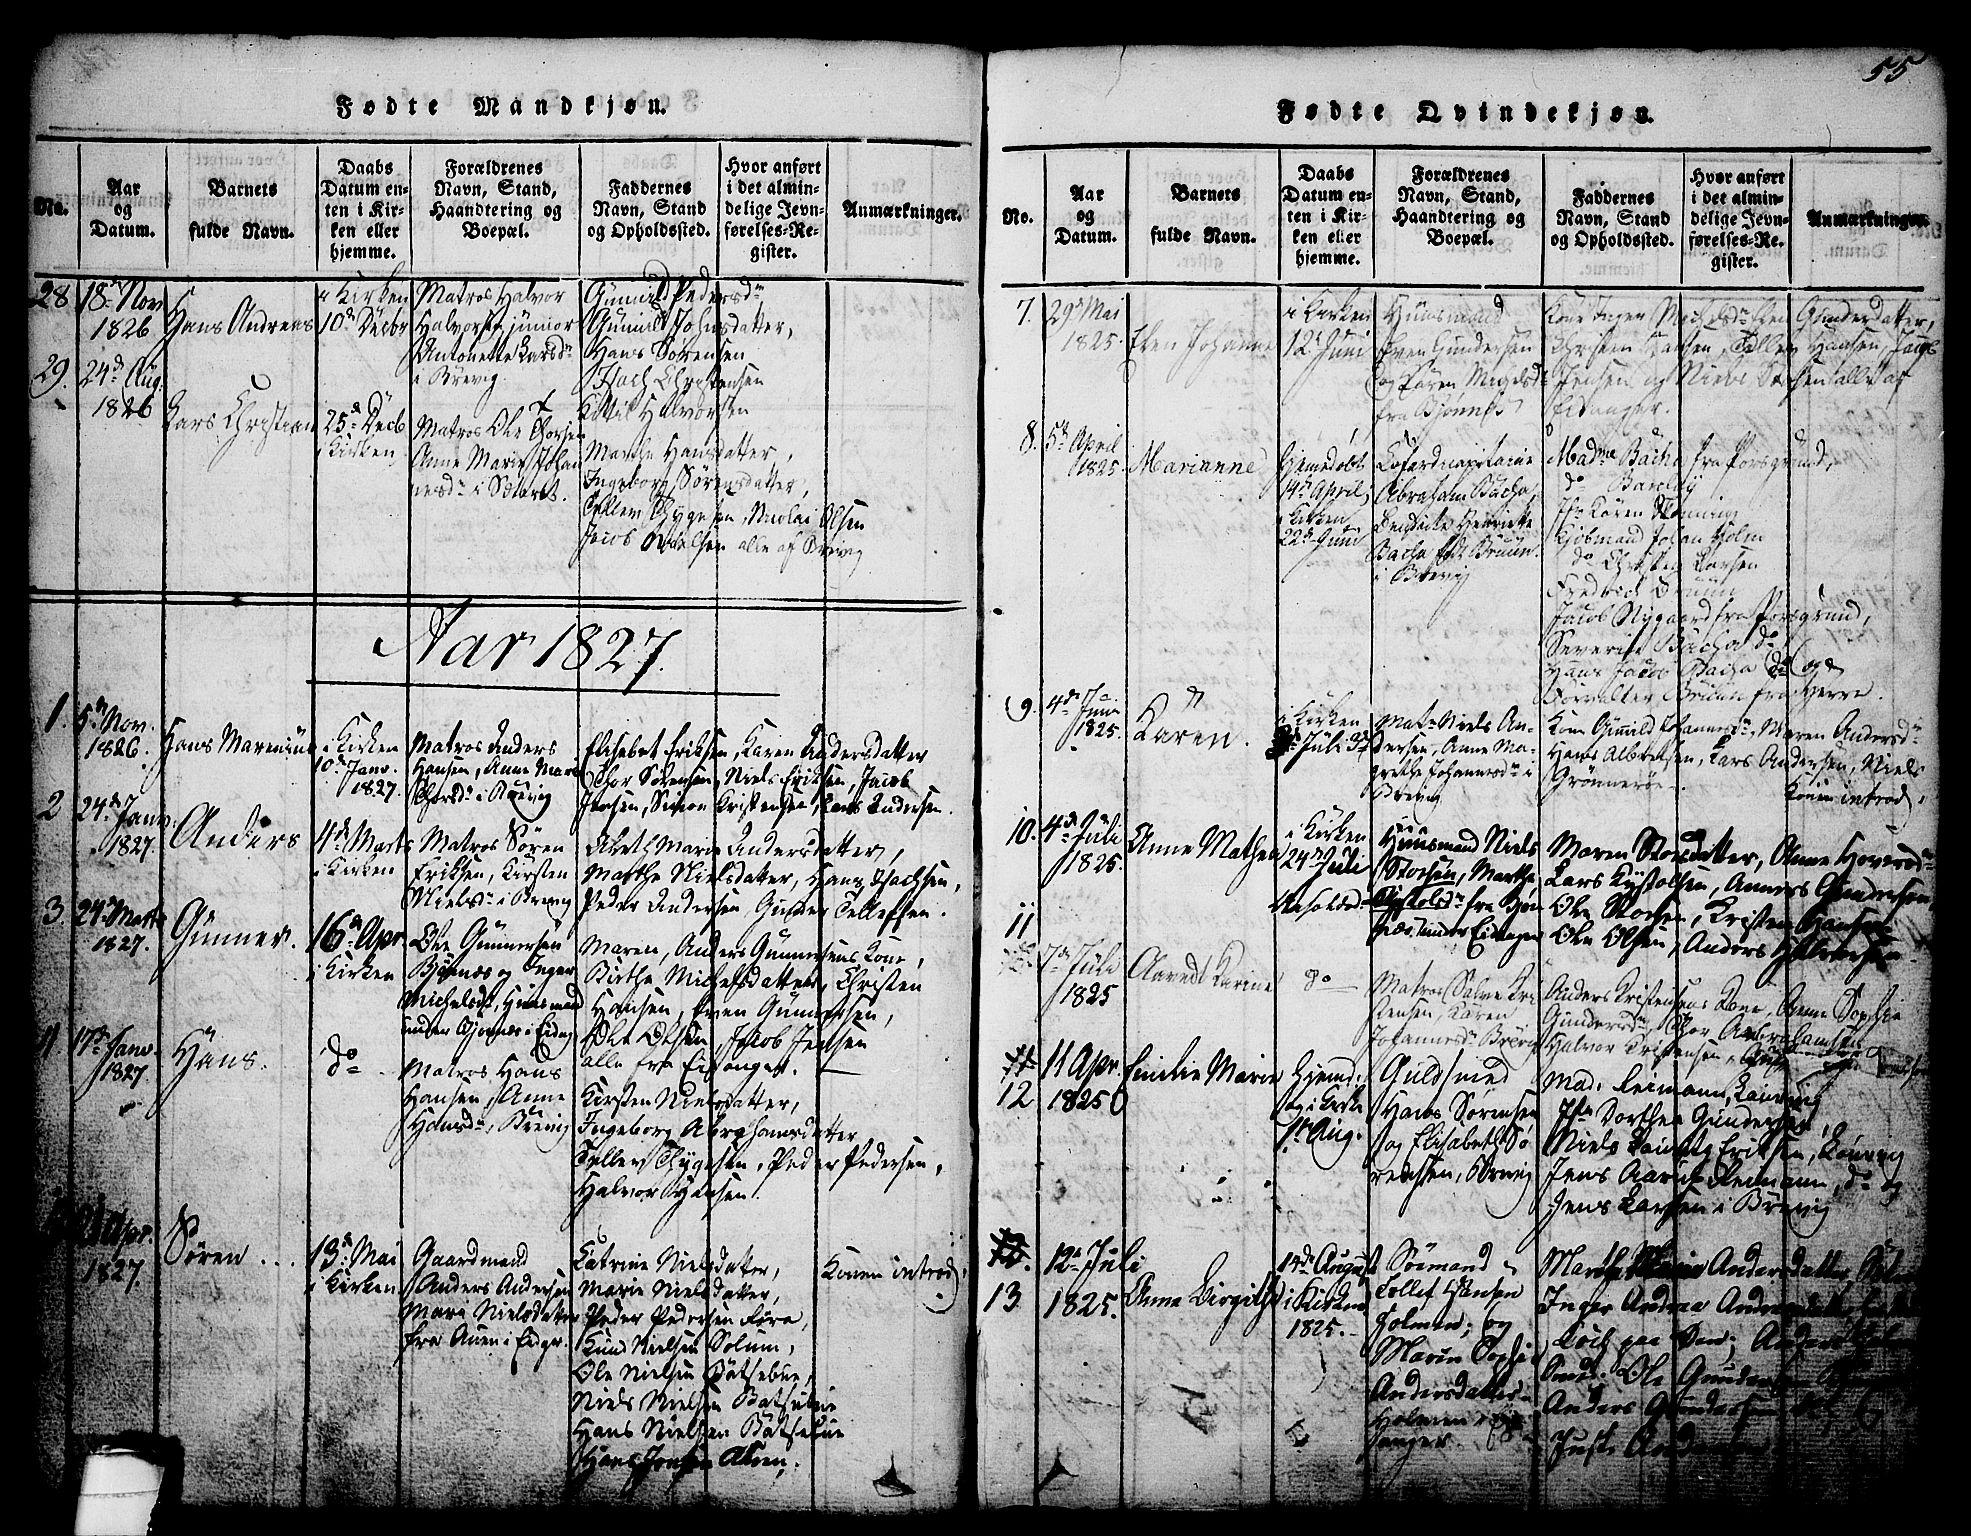 SAKO, Brevik kirkebøker, G/Ga/L0001: Klokkerbok nr. 1, 1814-1845, s. 55